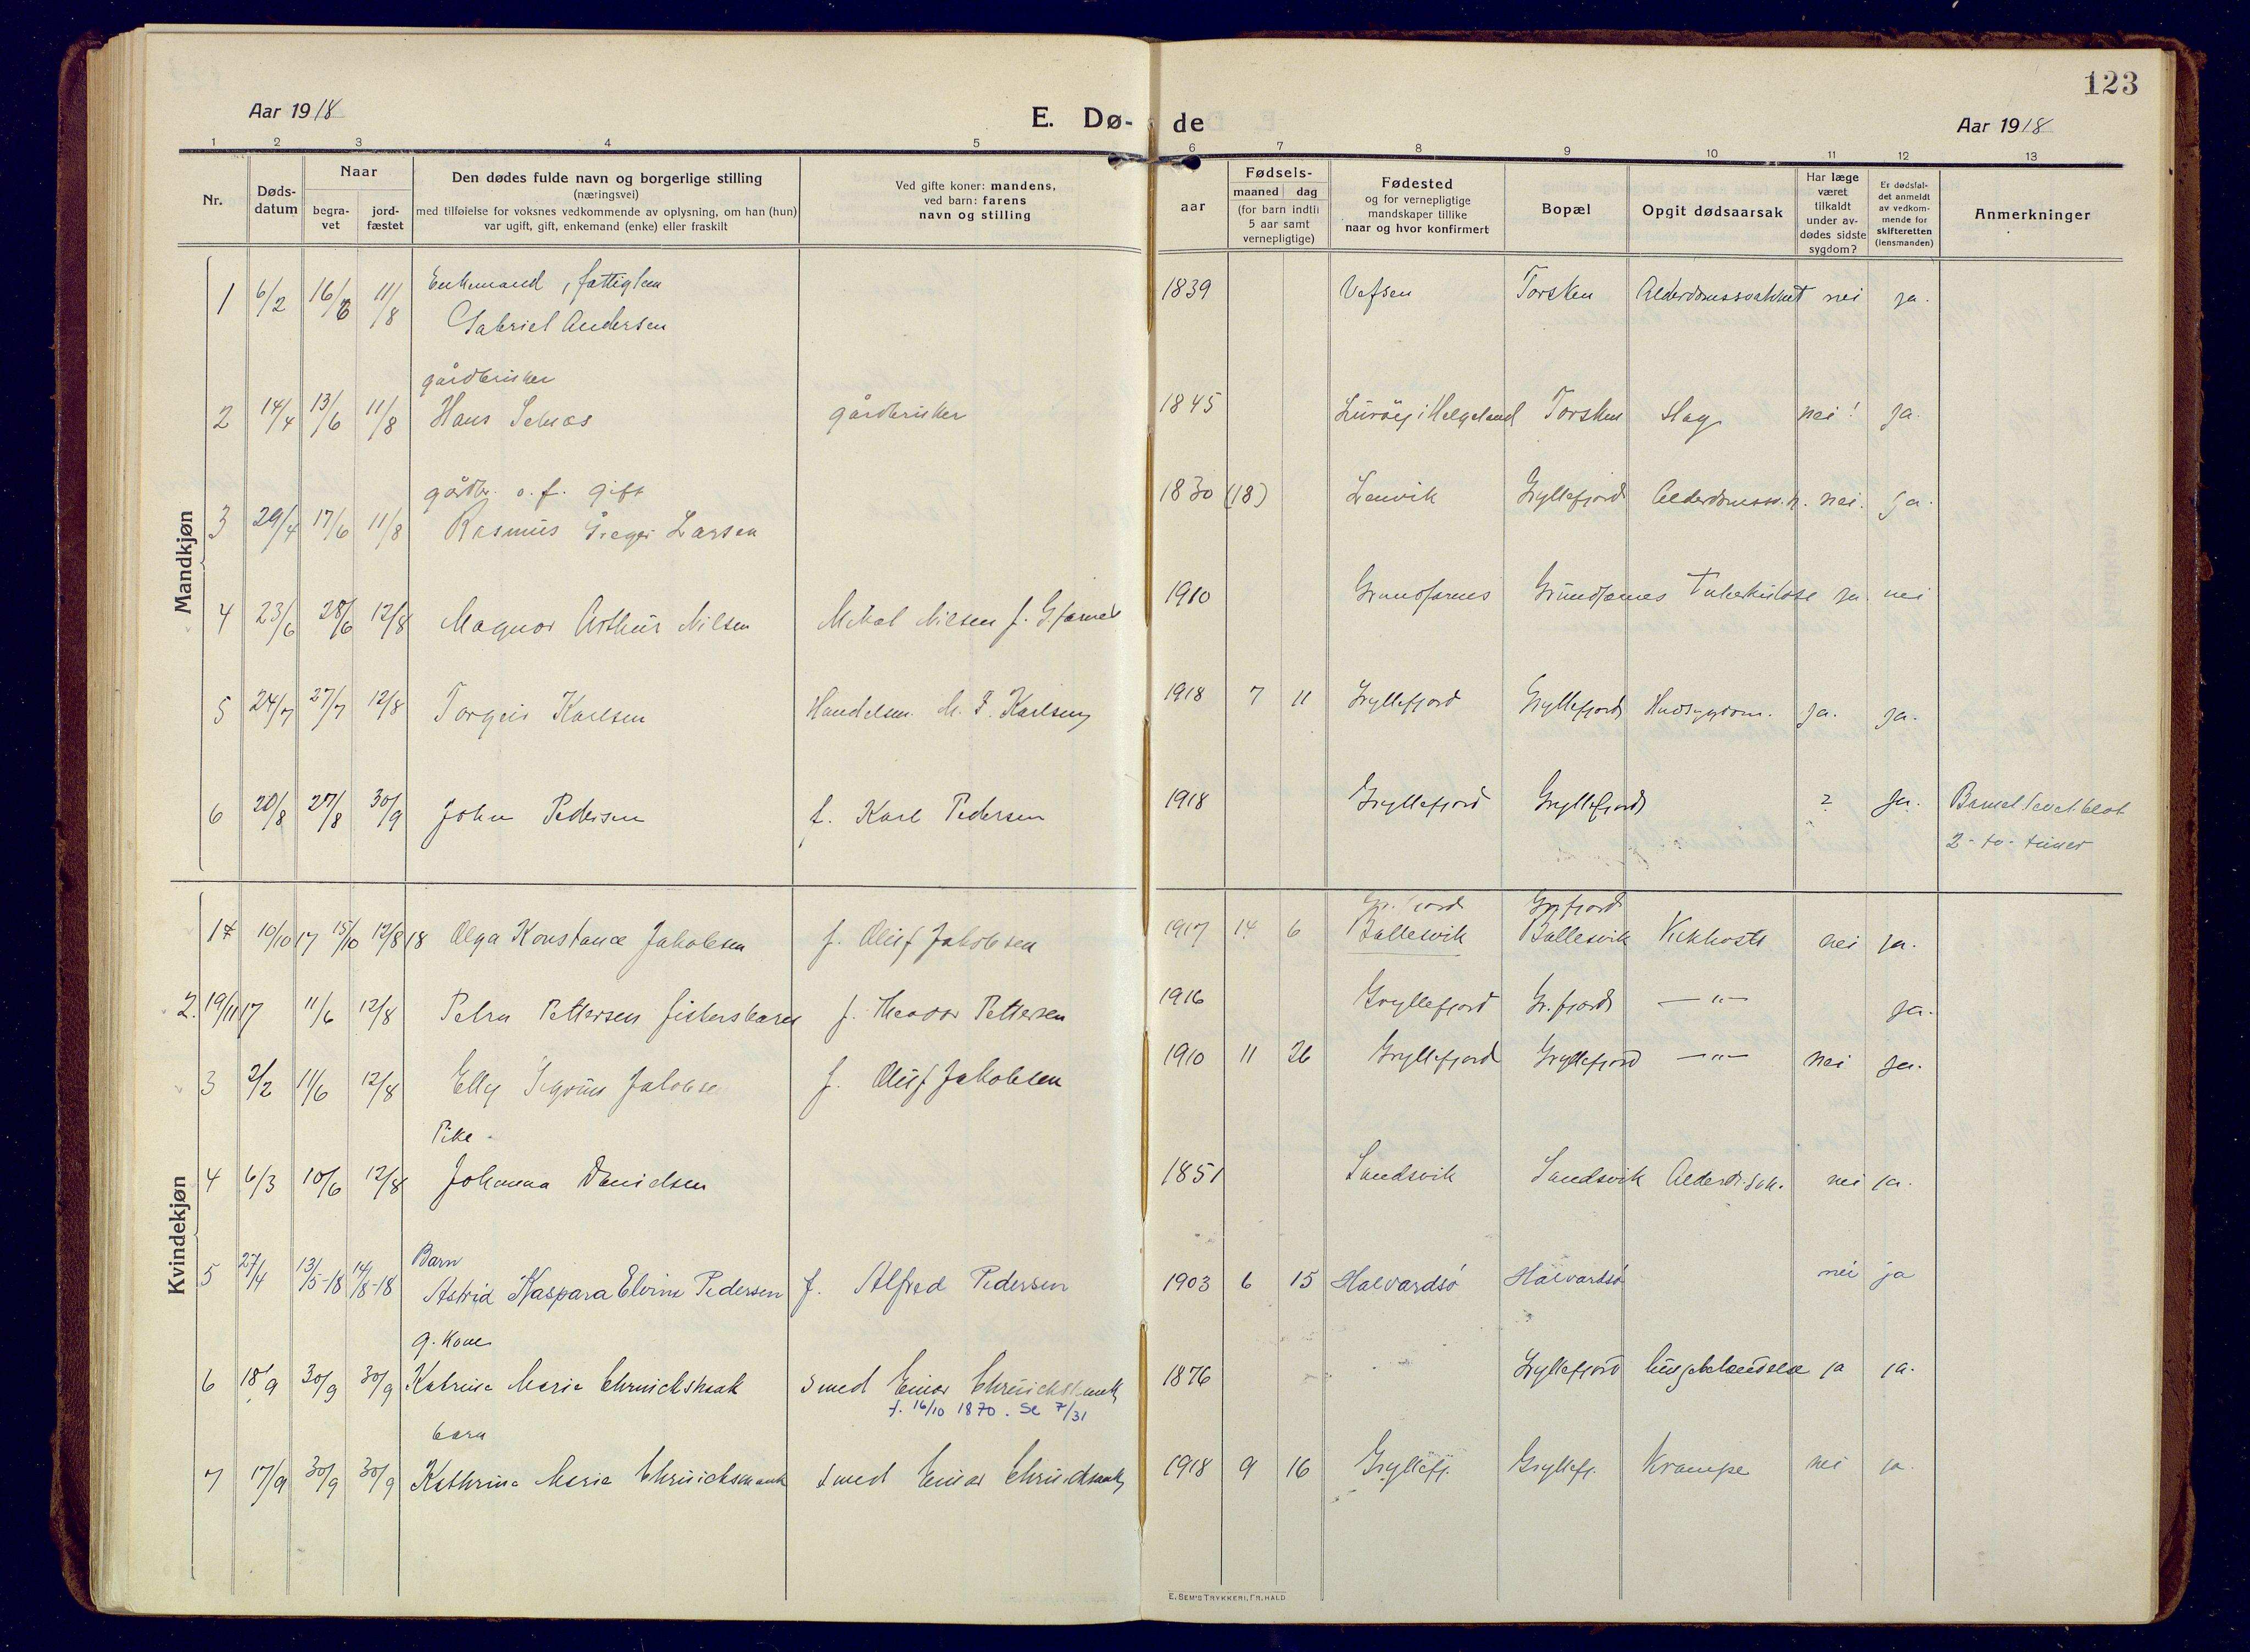 SATØ, Mefjord/Berg sokneprestkontor, G/Ga/Gaa: Ministerialbok nr. 10, 1916-1928, s. 123